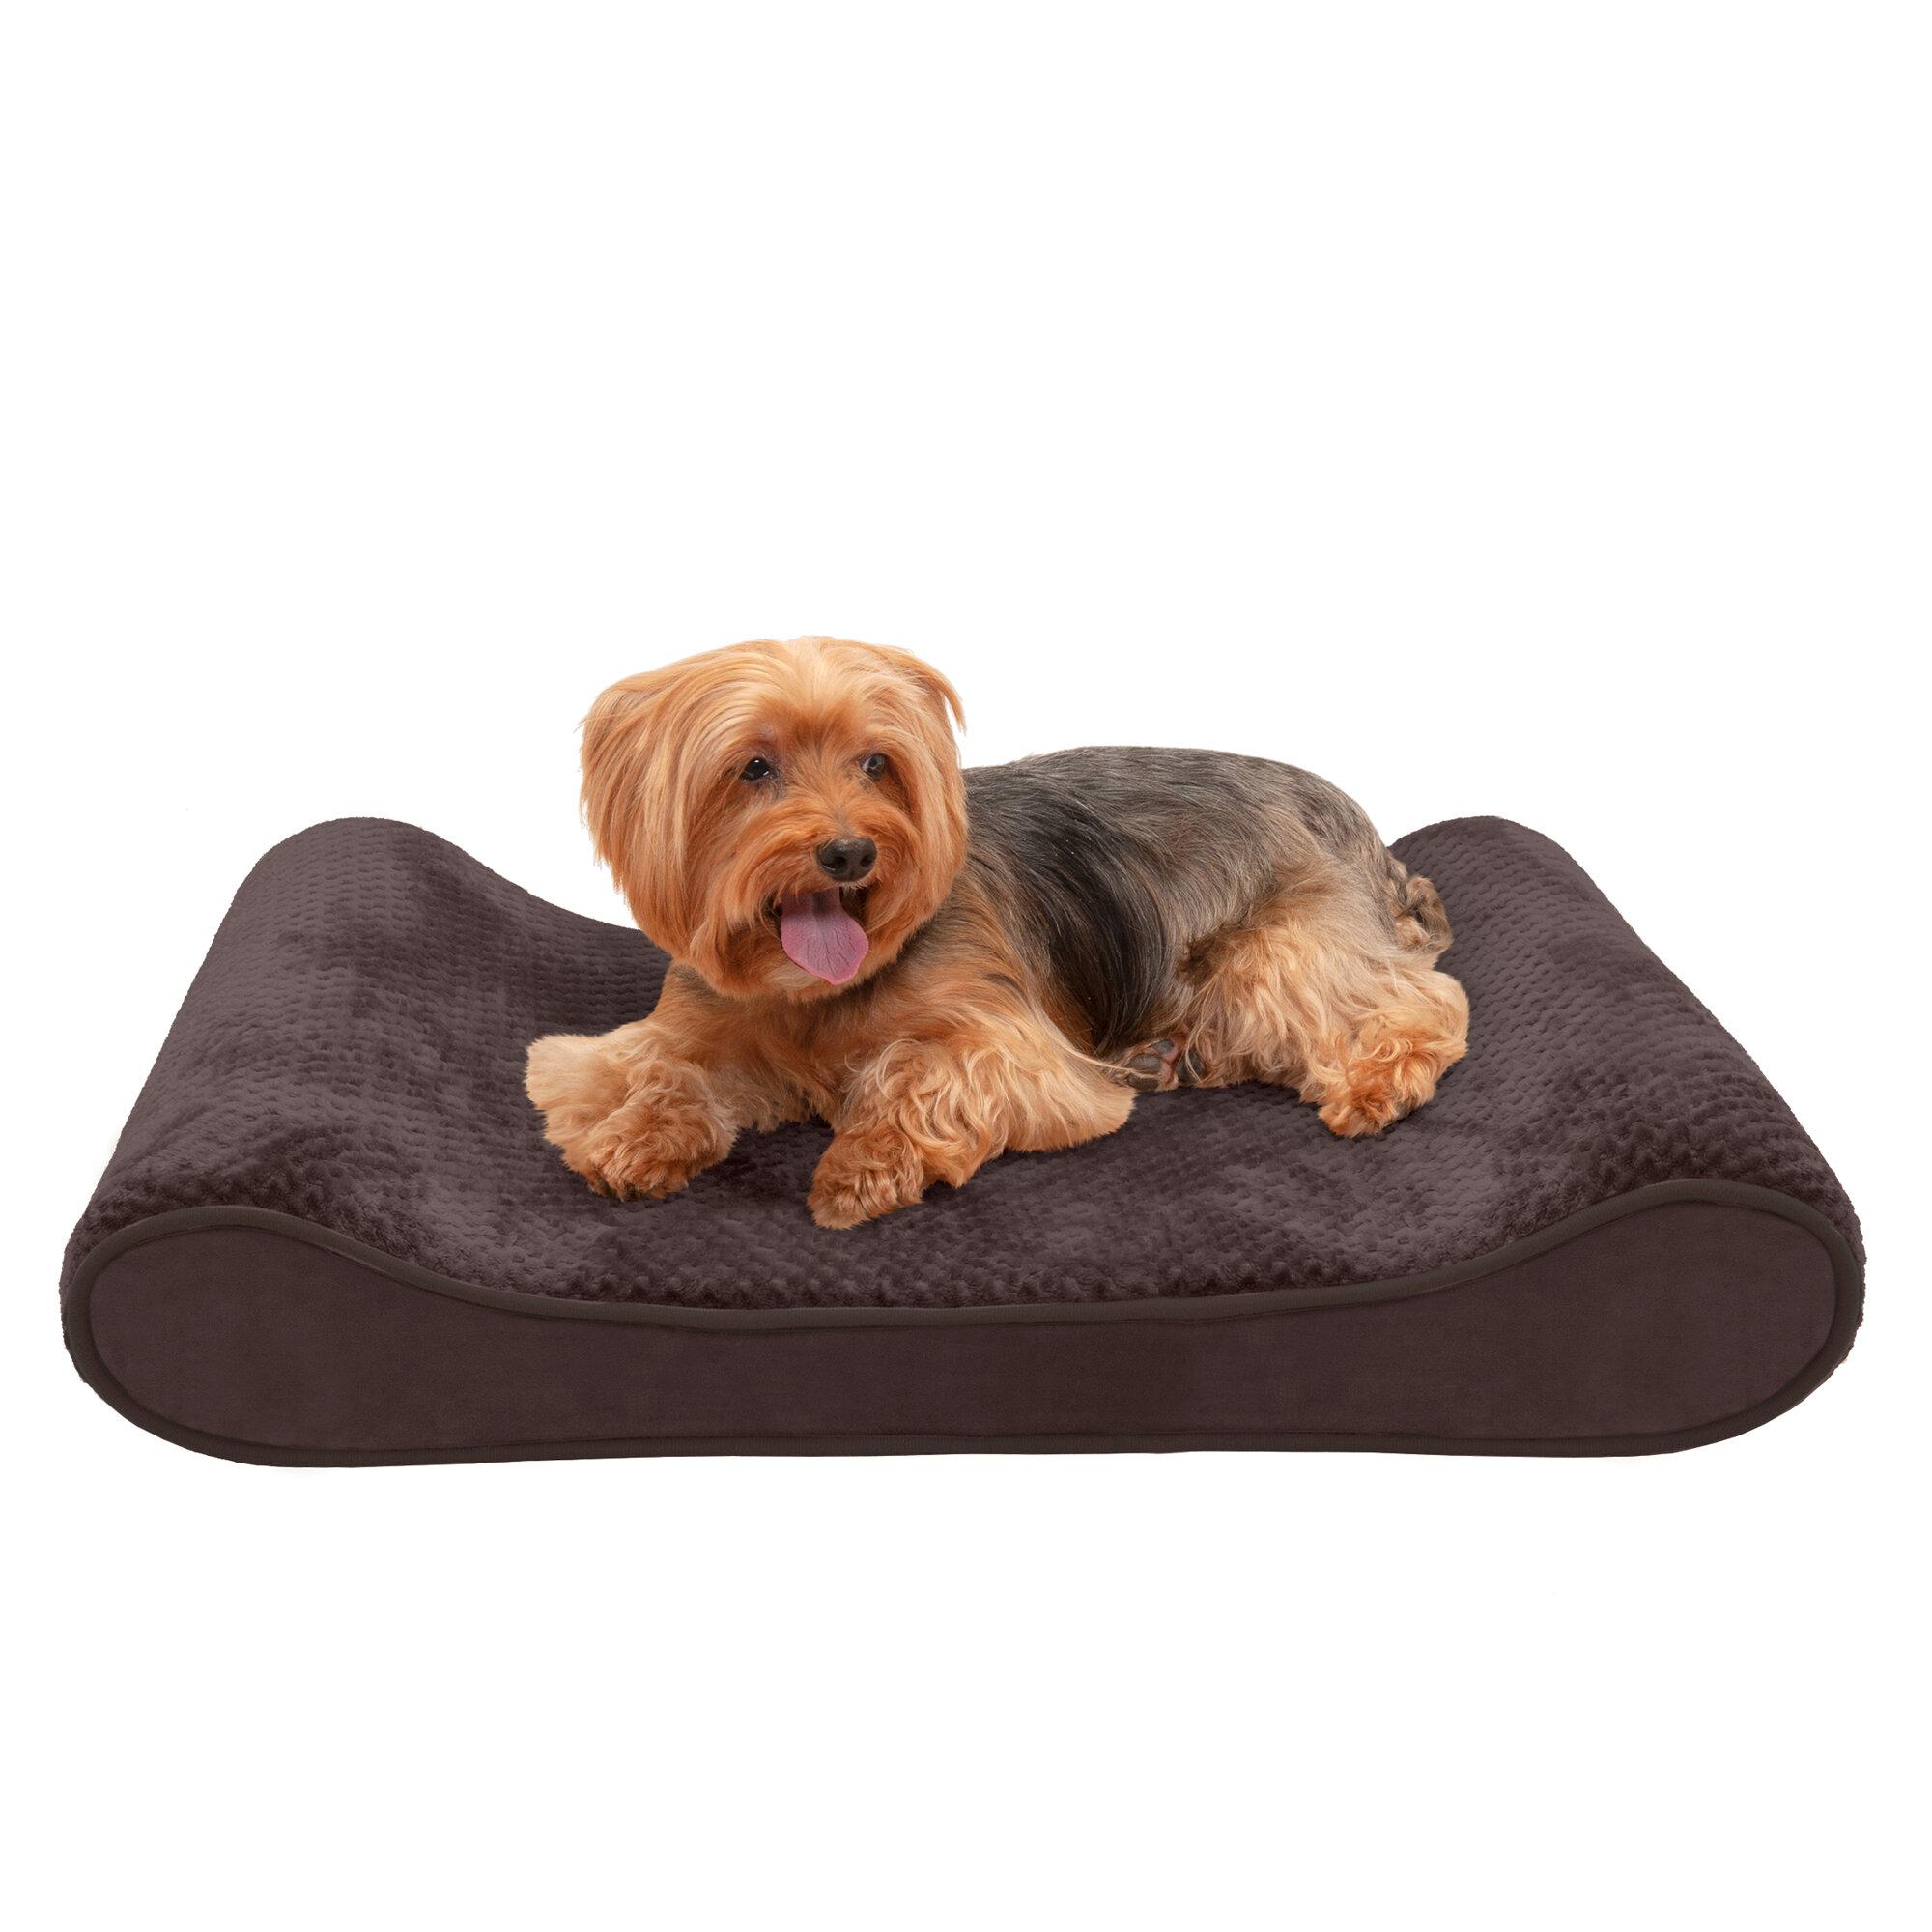 Memory Foam Orthopedic Tucker Murphy Pet Crate Kennel Mats You Ll Love In 2021 Wayfair